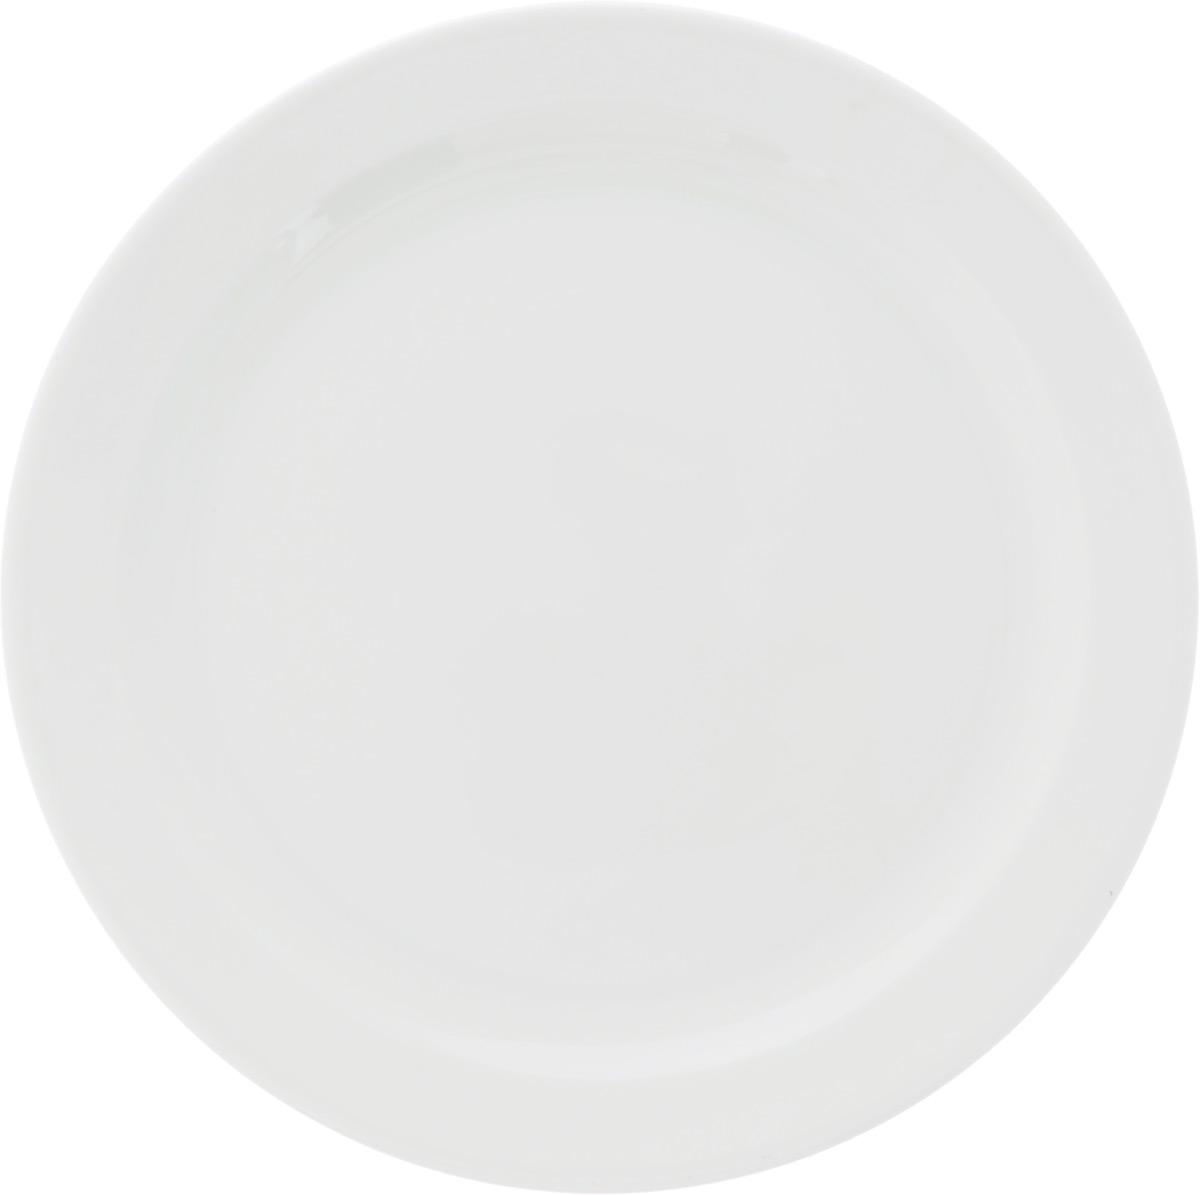 Тарелка мелкая Ariane Прайм, диаметр 24 см